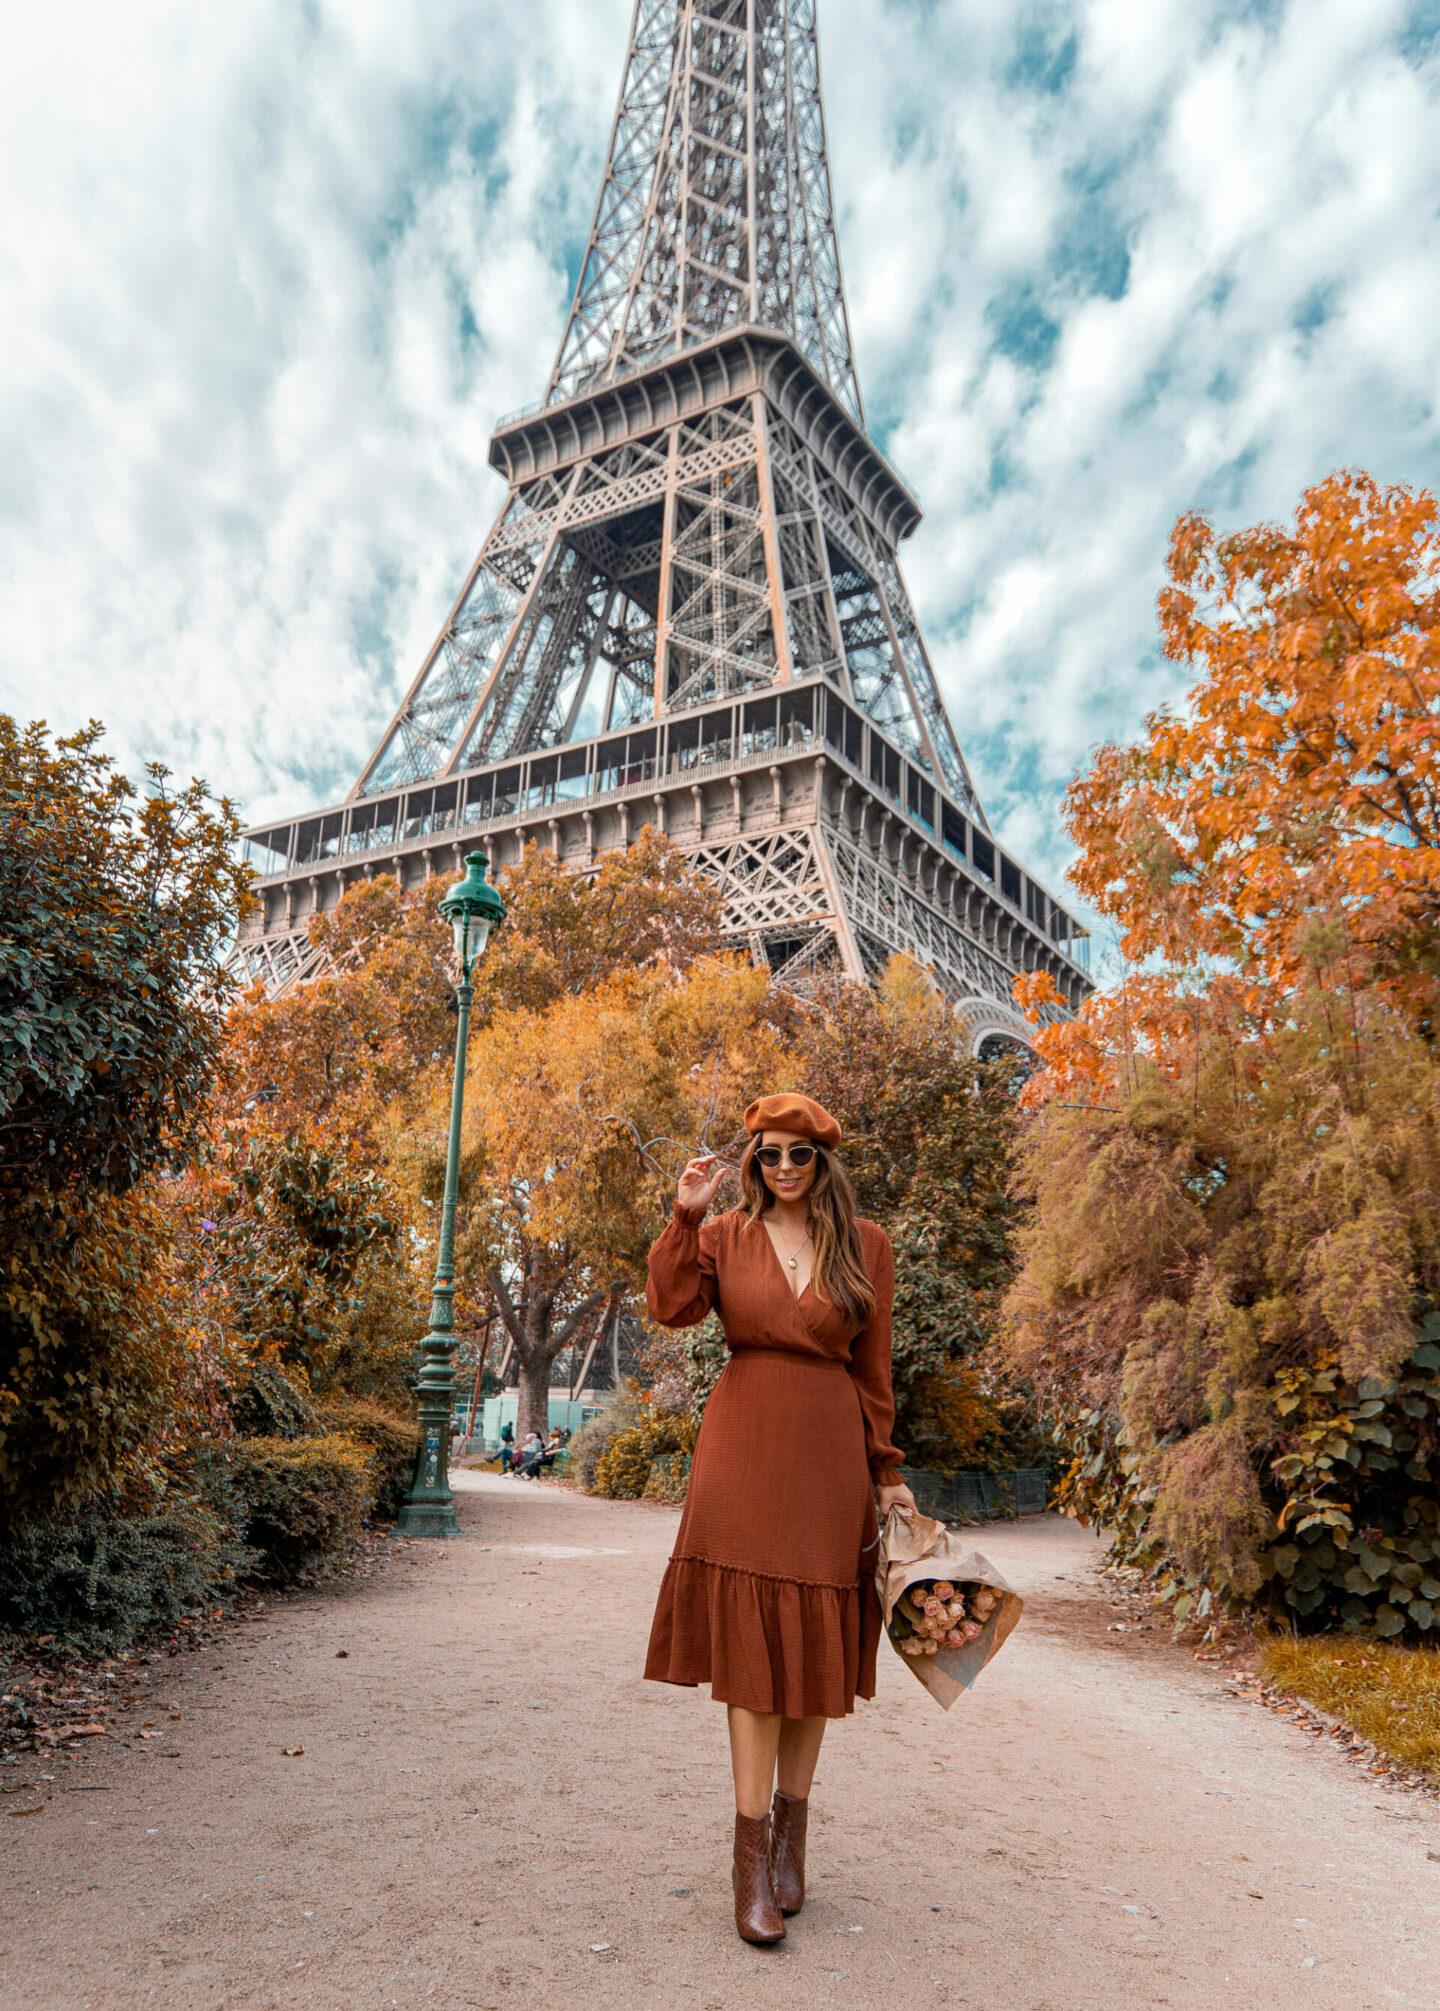 Paris Instagrammable Locations kelseyinlondon kelsey heinrichs things to do in Paris bucketlist eiffel tower